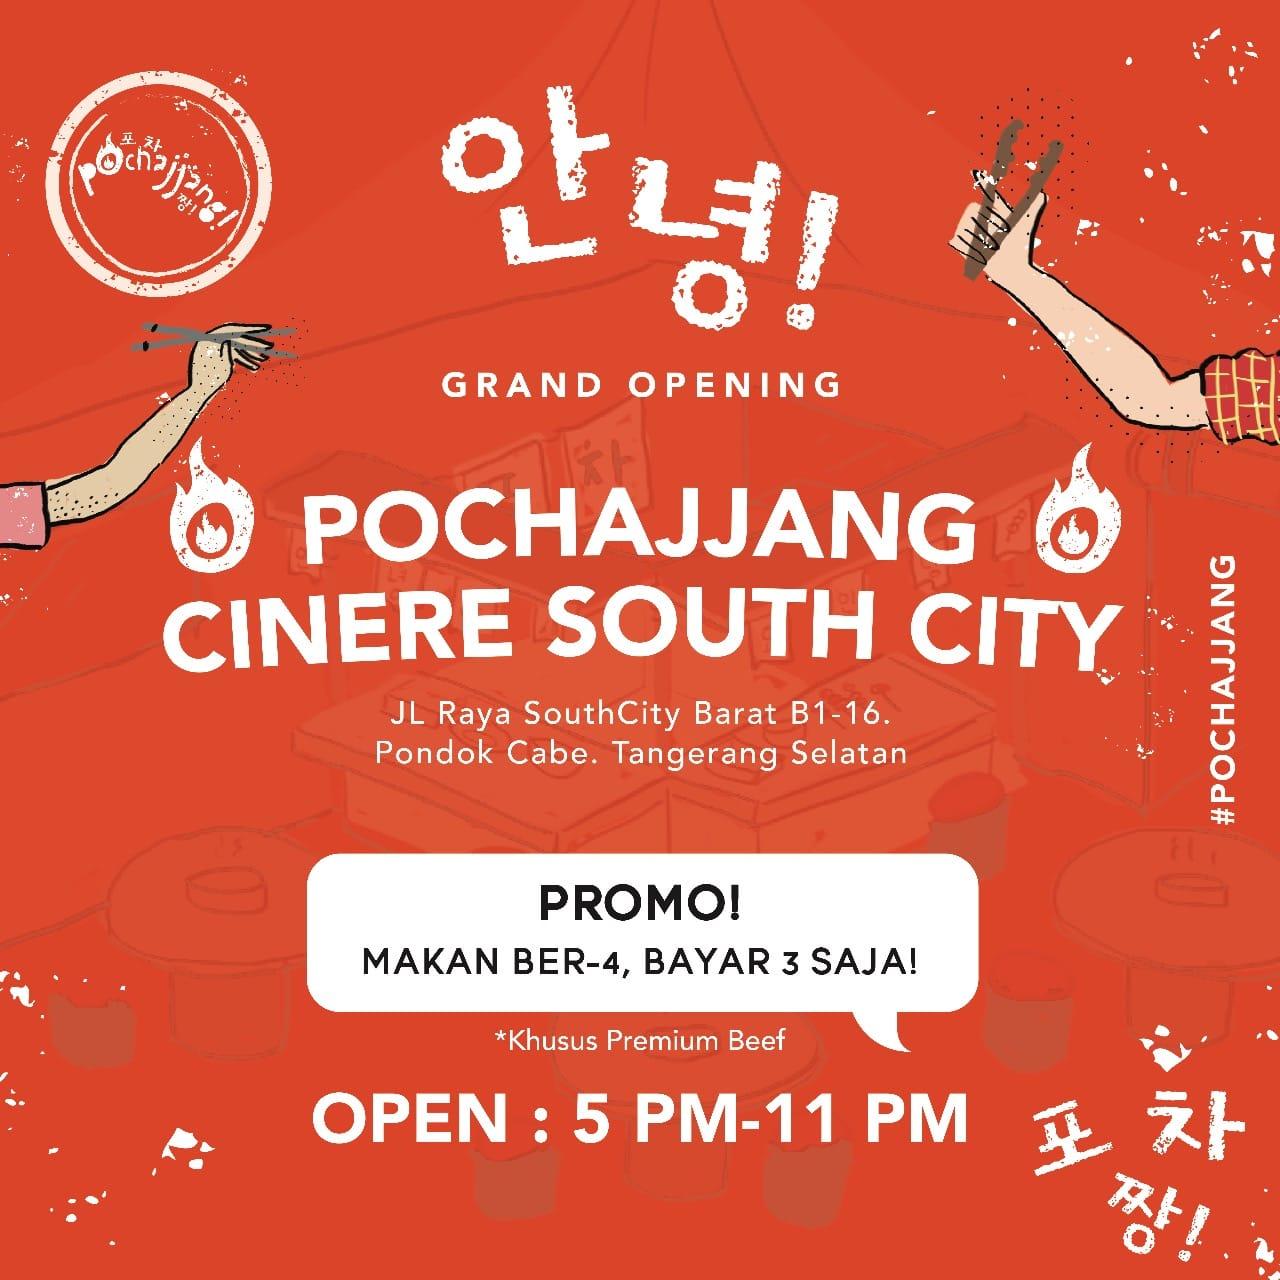 Pochajjang Korean BBQ Promo Grand Opening, Buy 3 Get 1 Free